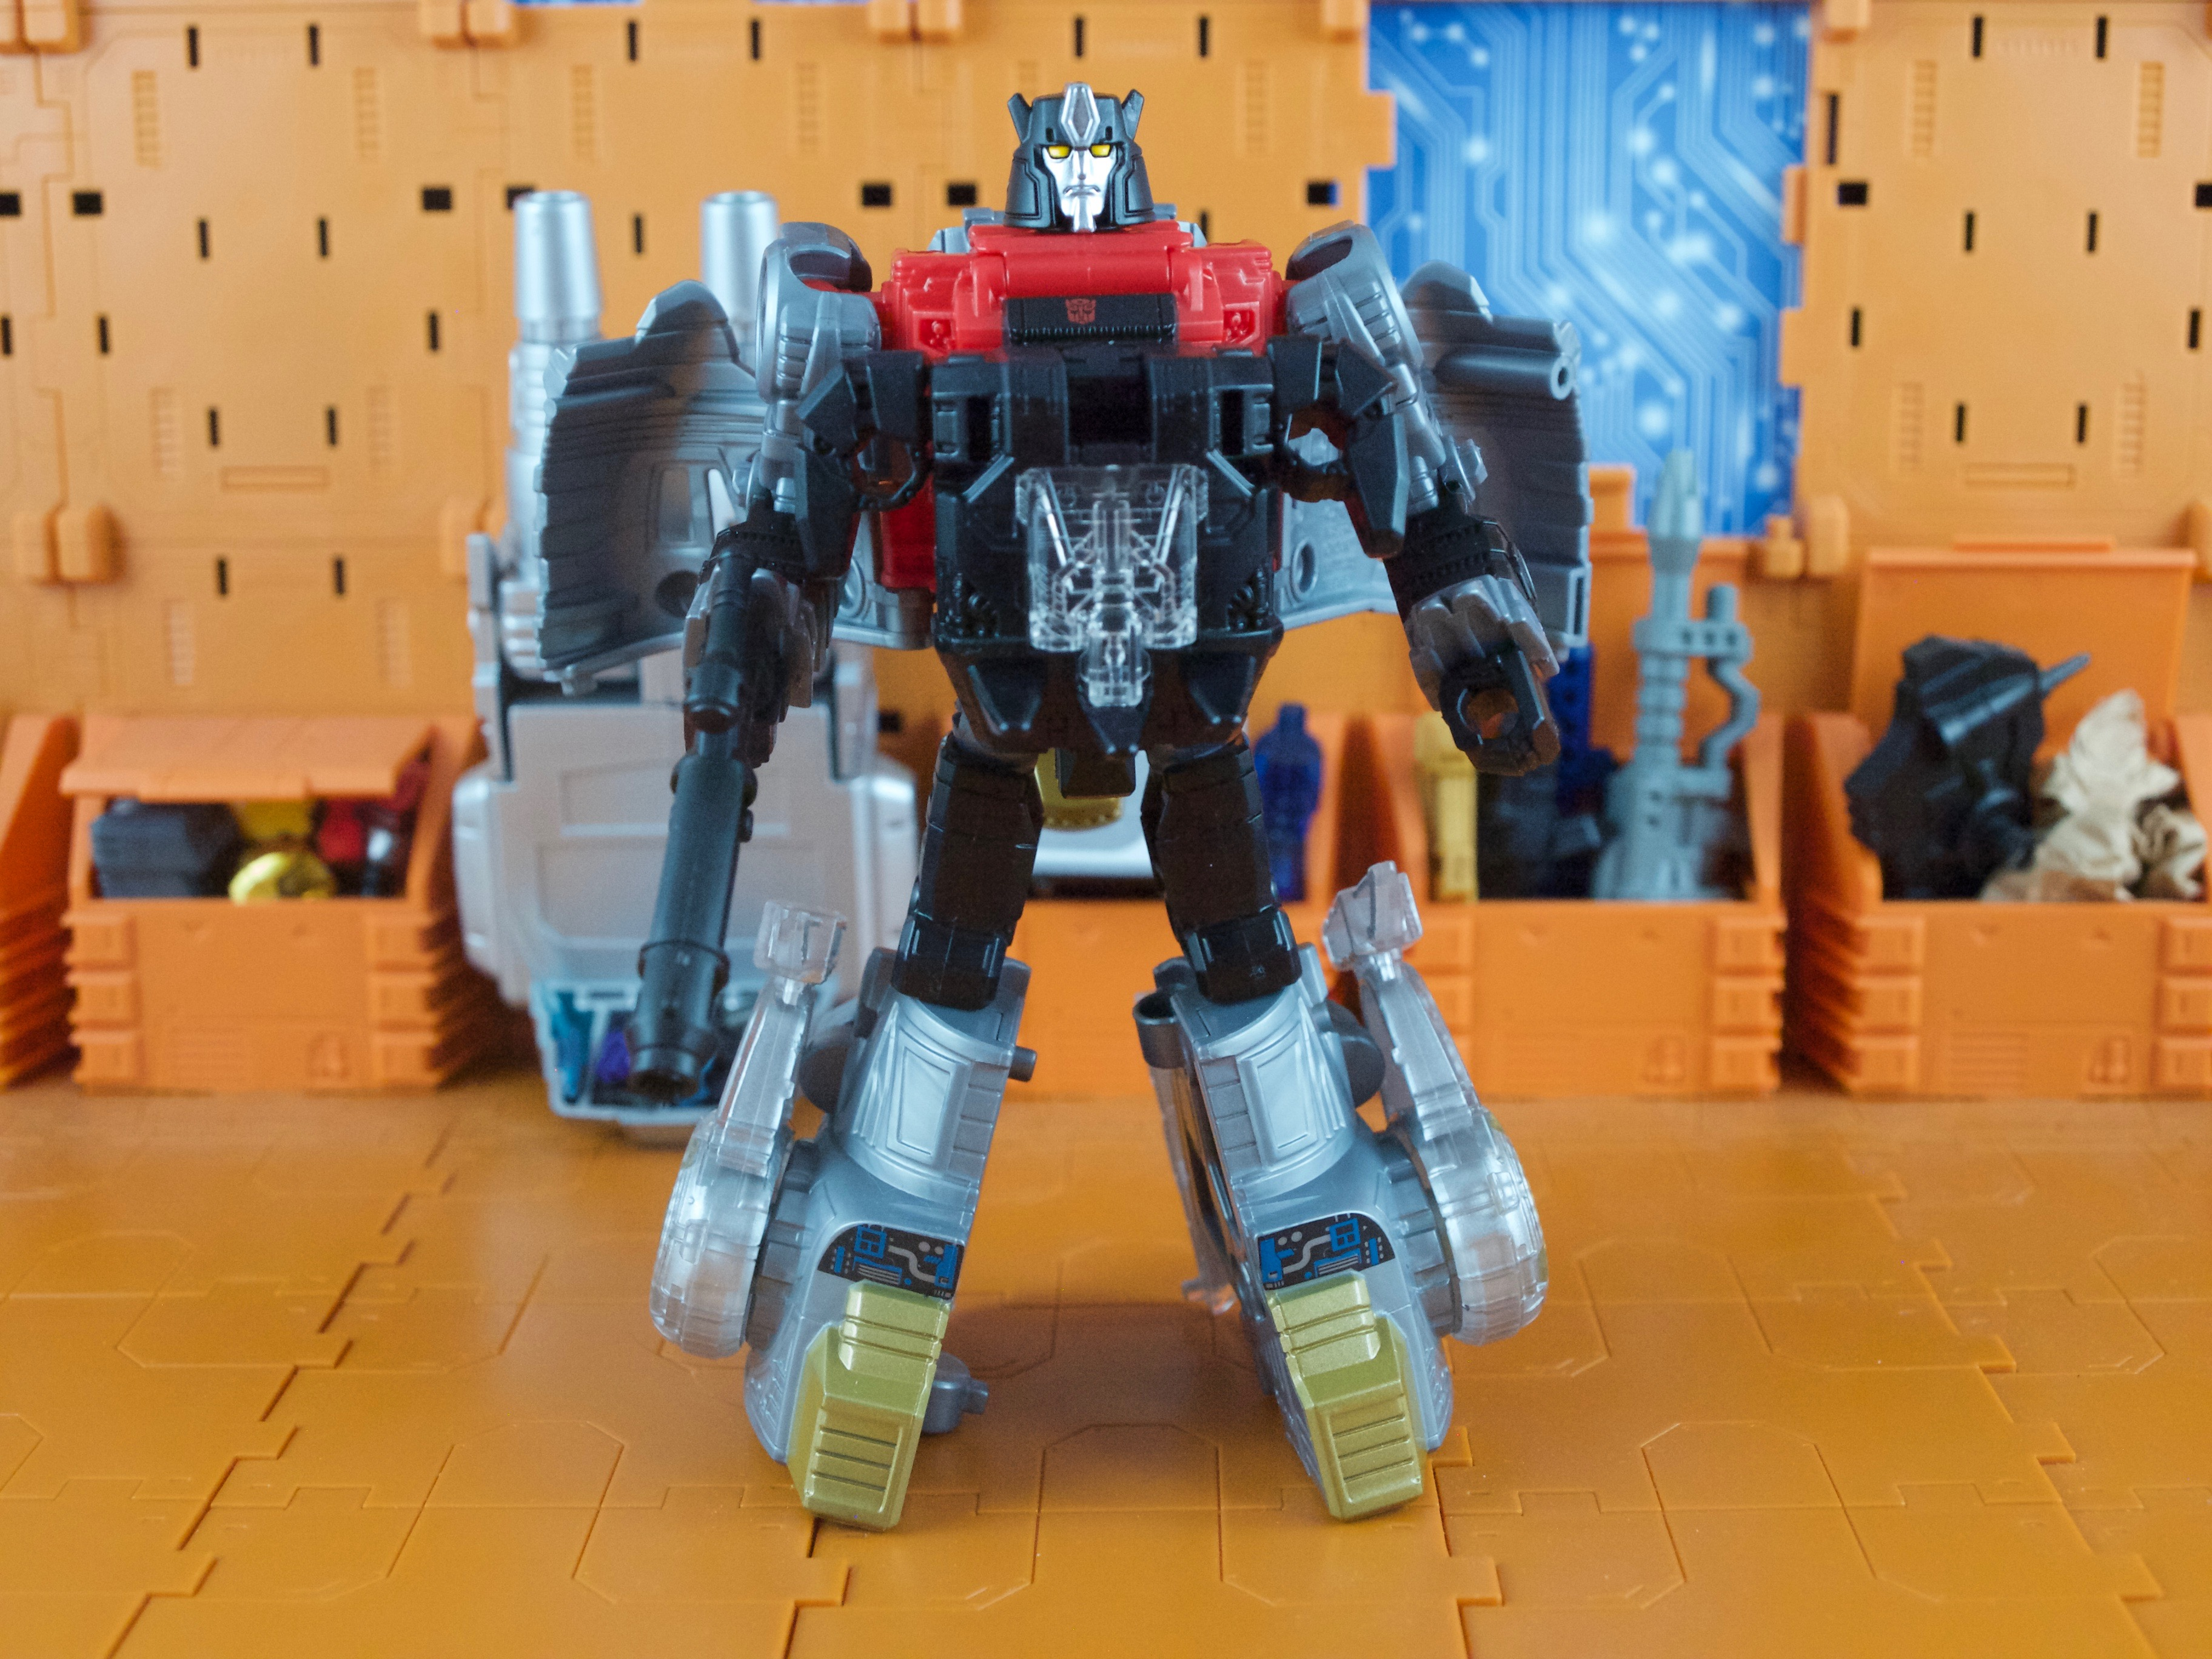 Sludge robot mode armor